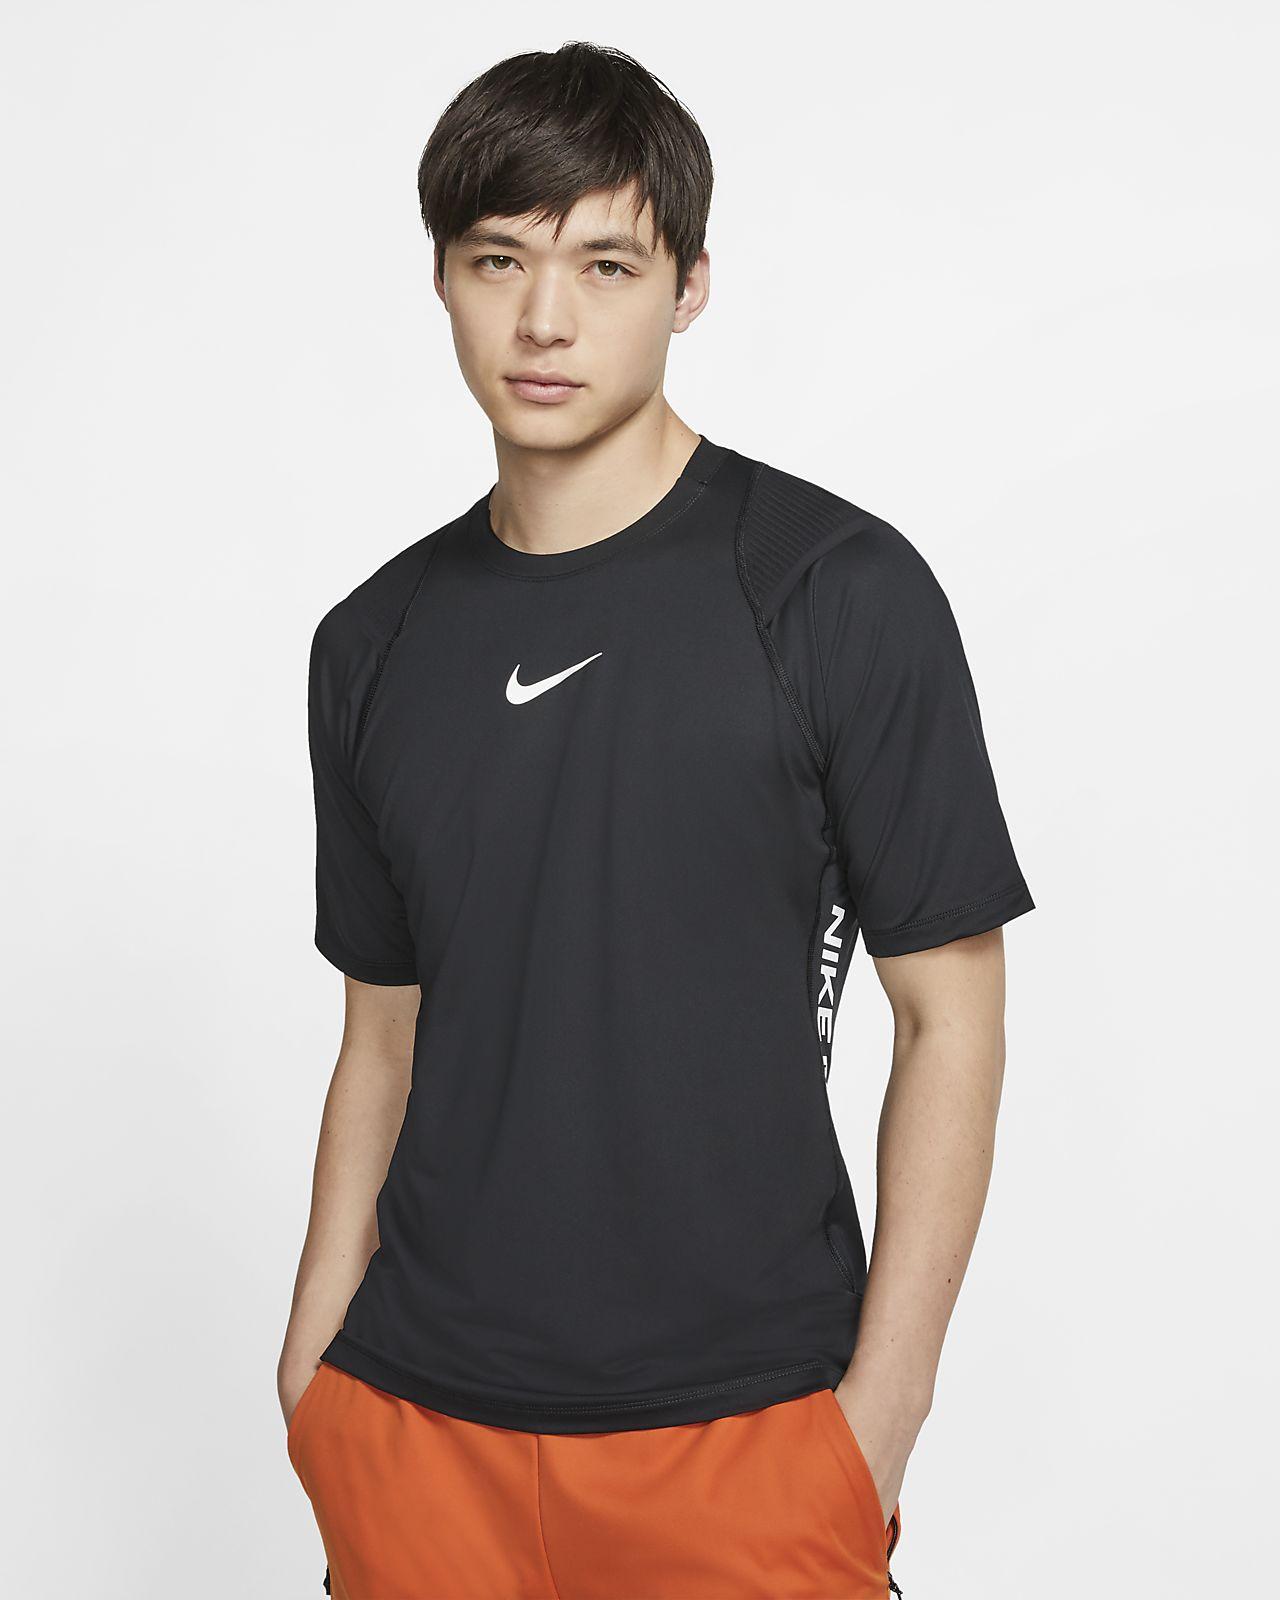 Nike Pro AeroAdapt Kısa Kollu Erkek Üstü